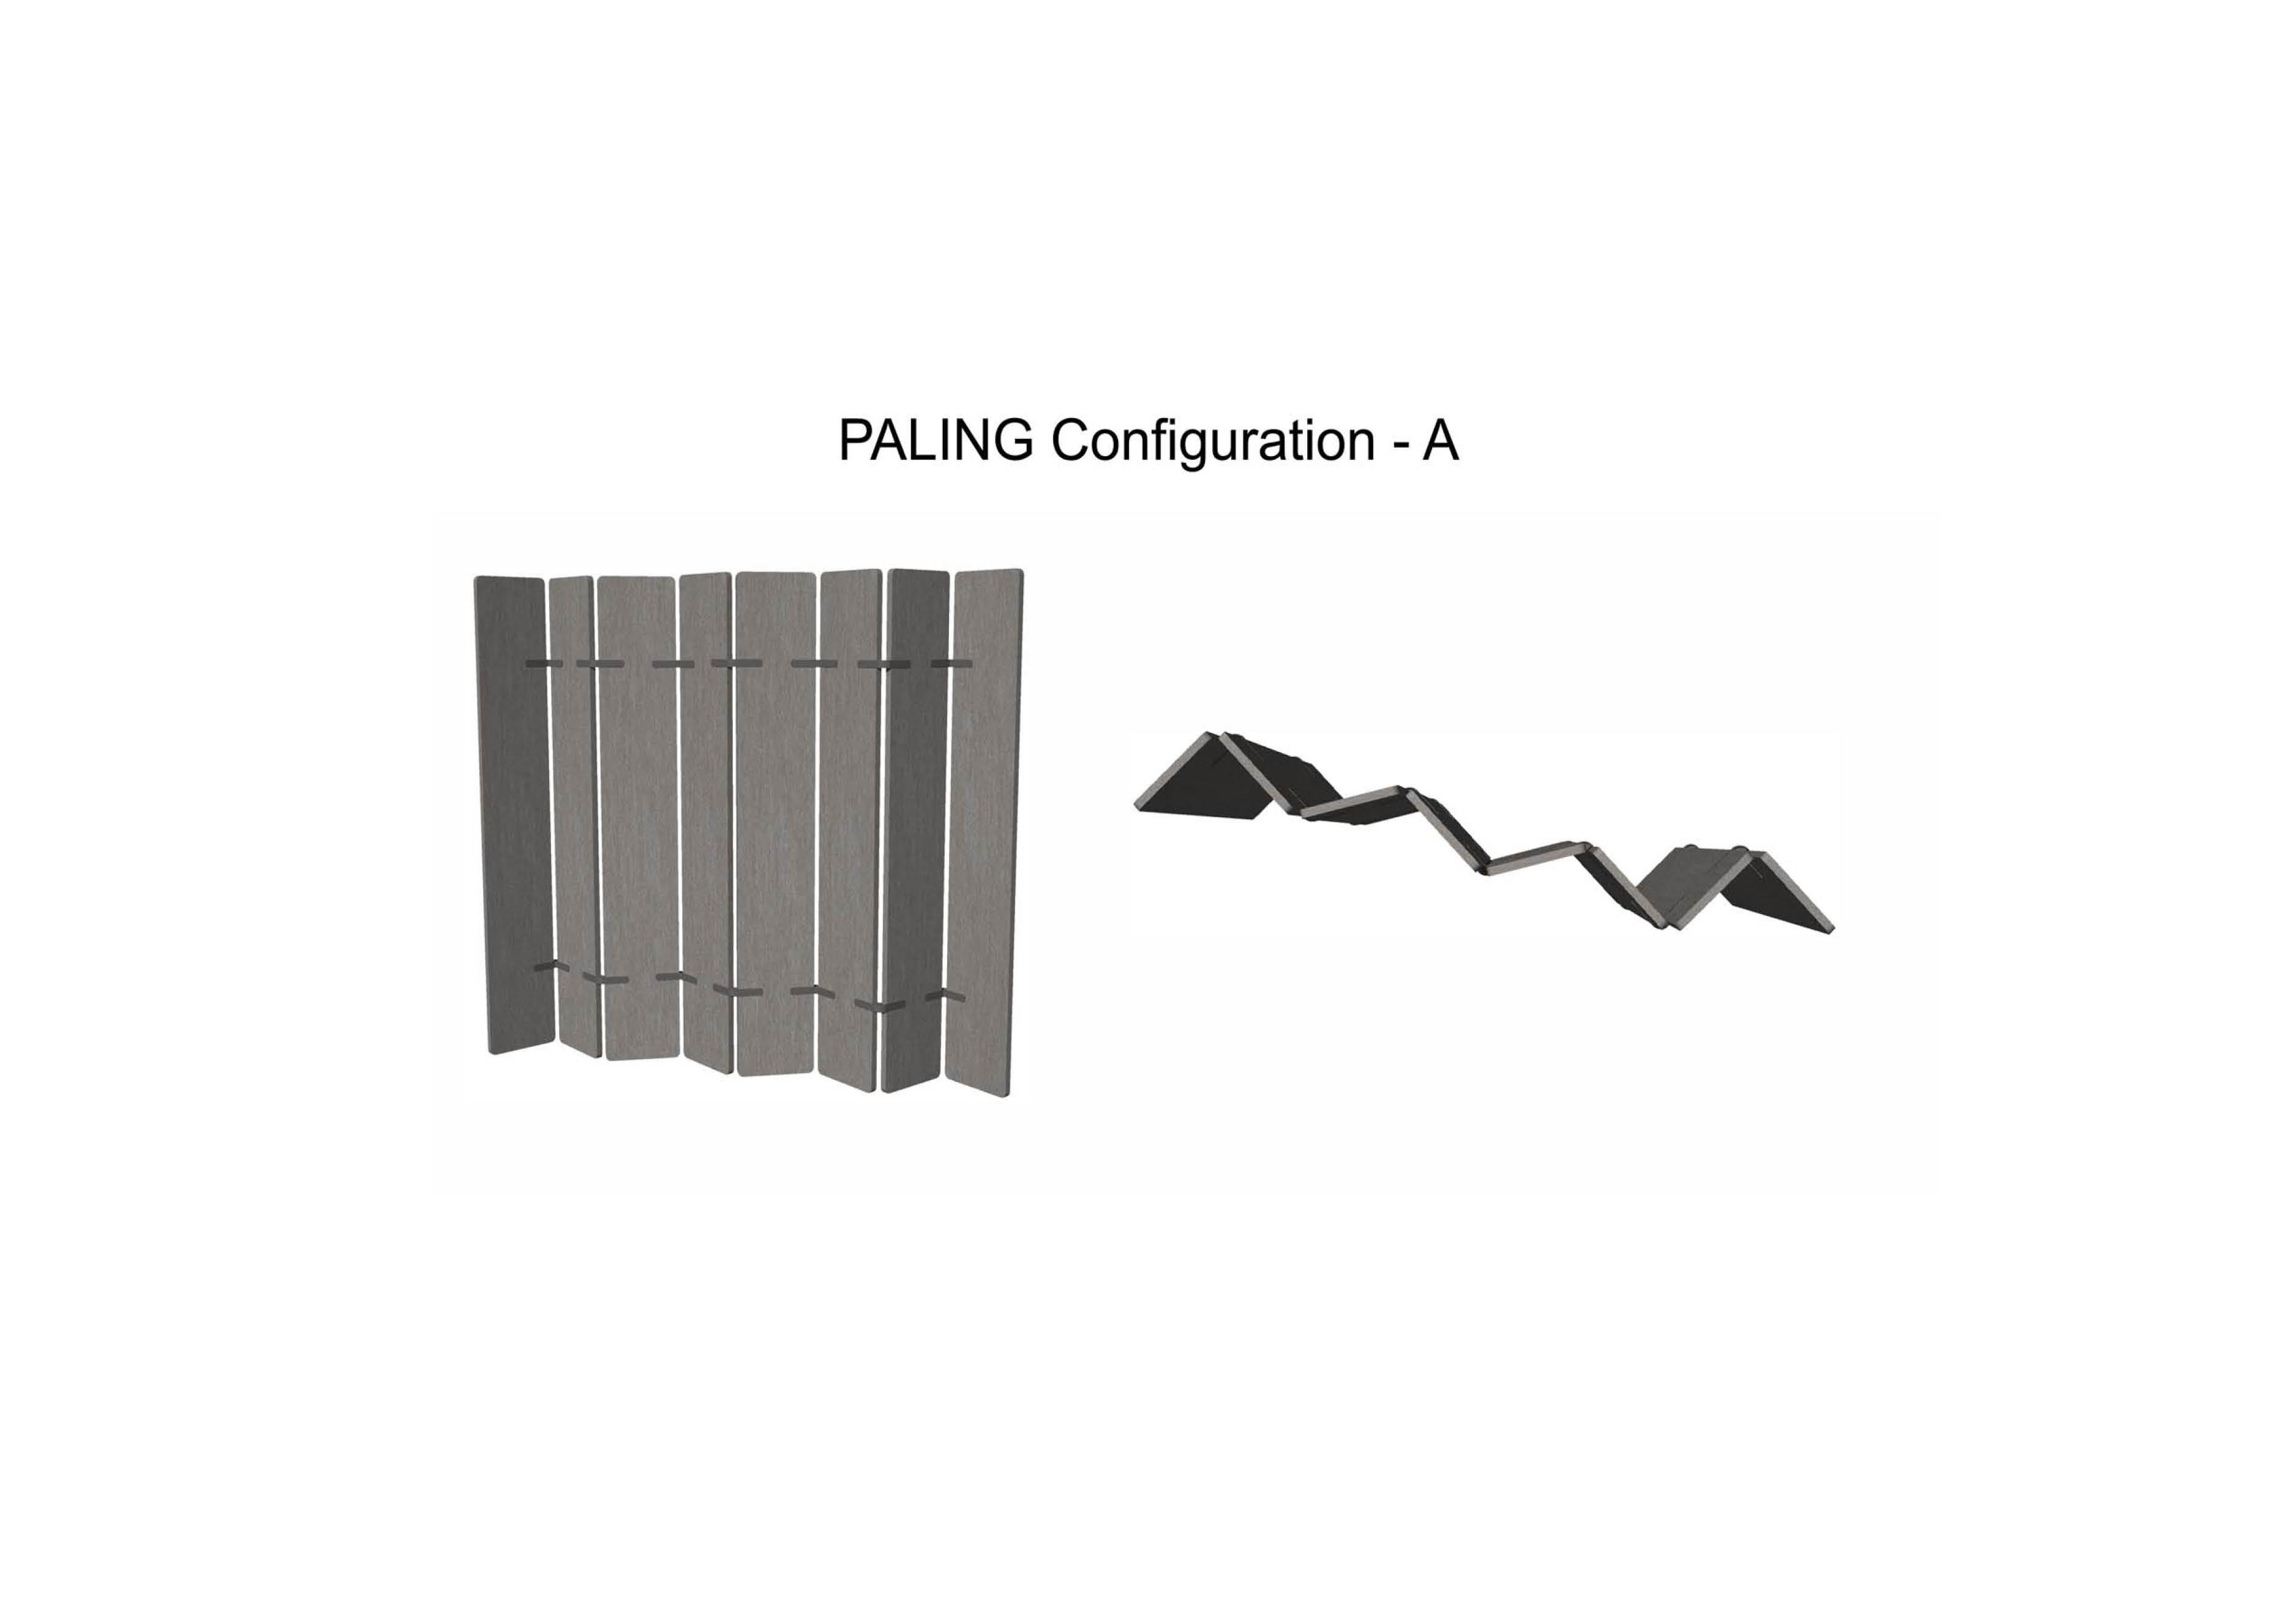 Paling Configuration 1